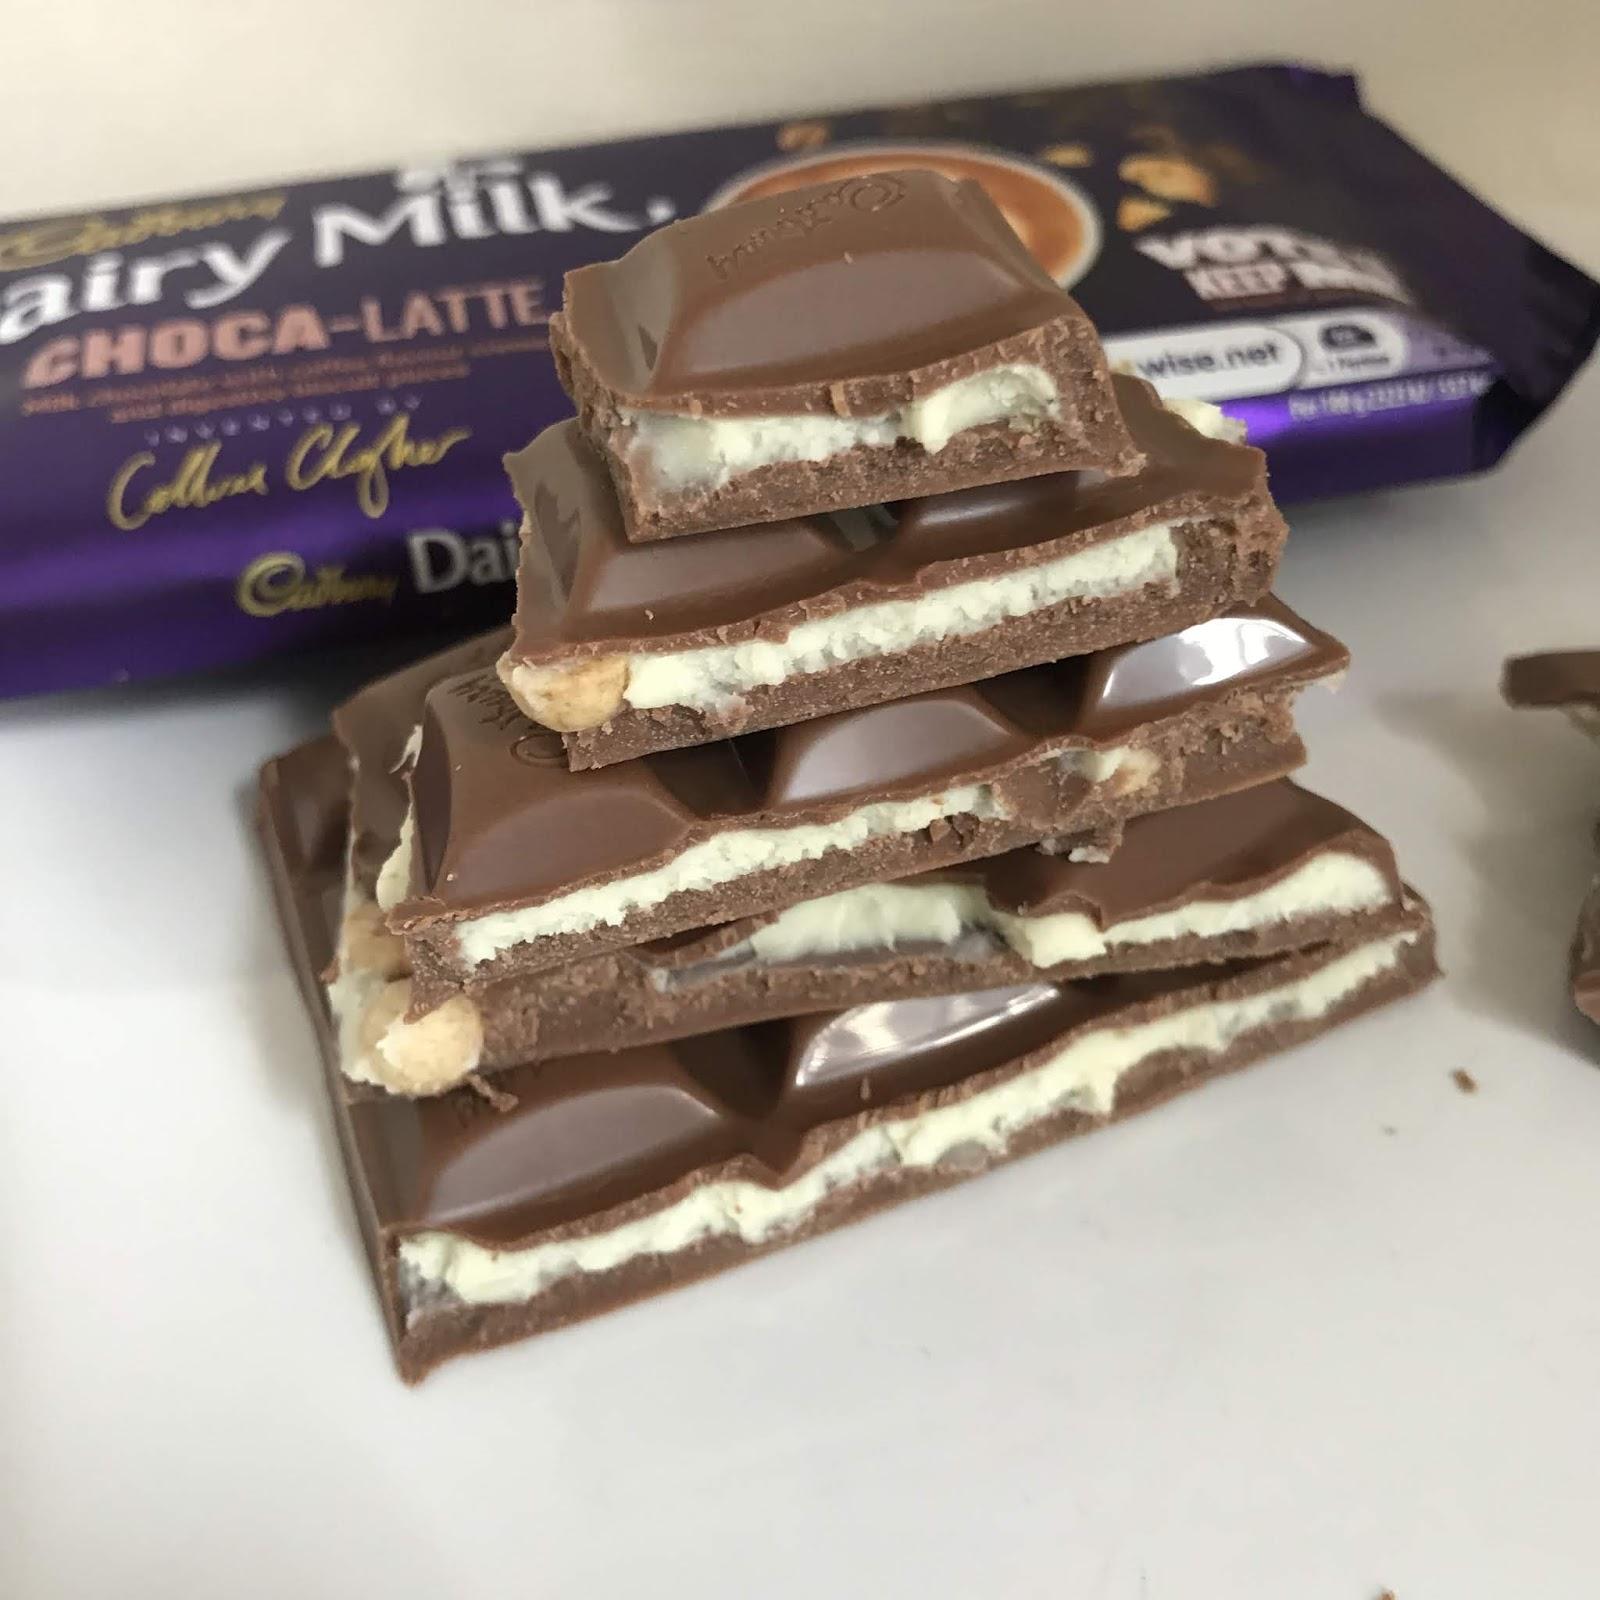 Cadbury Dairy Milk Choca Latte